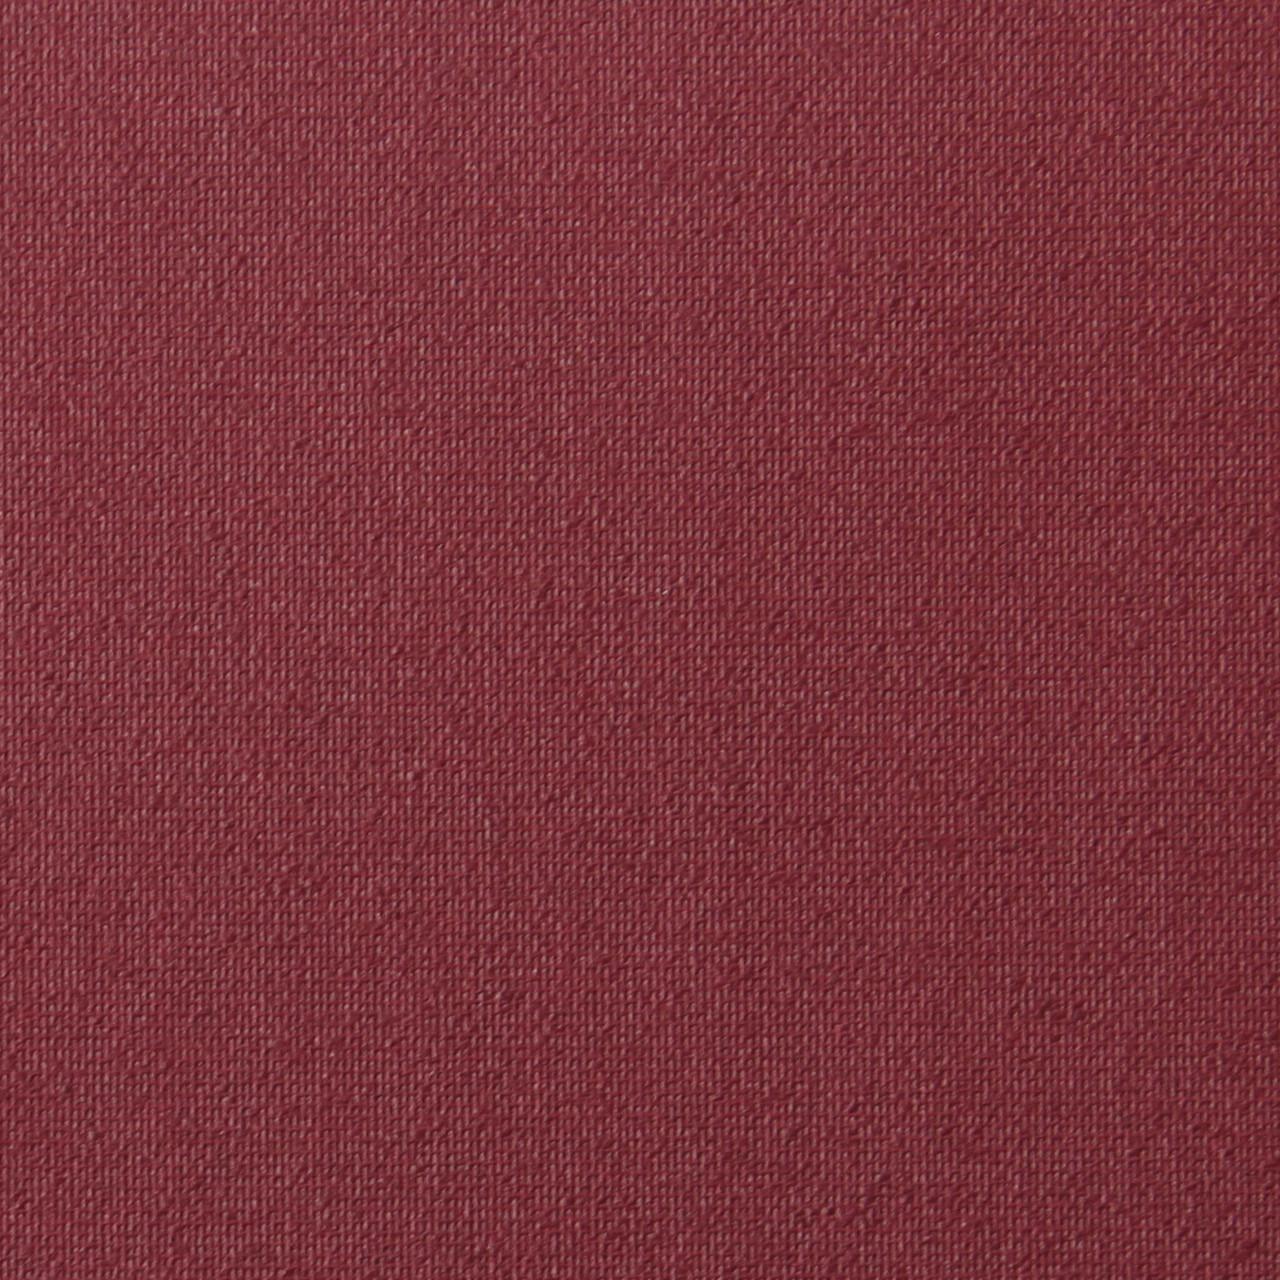 Рулонные шторы Ткань Однотонная А-626 Бордо